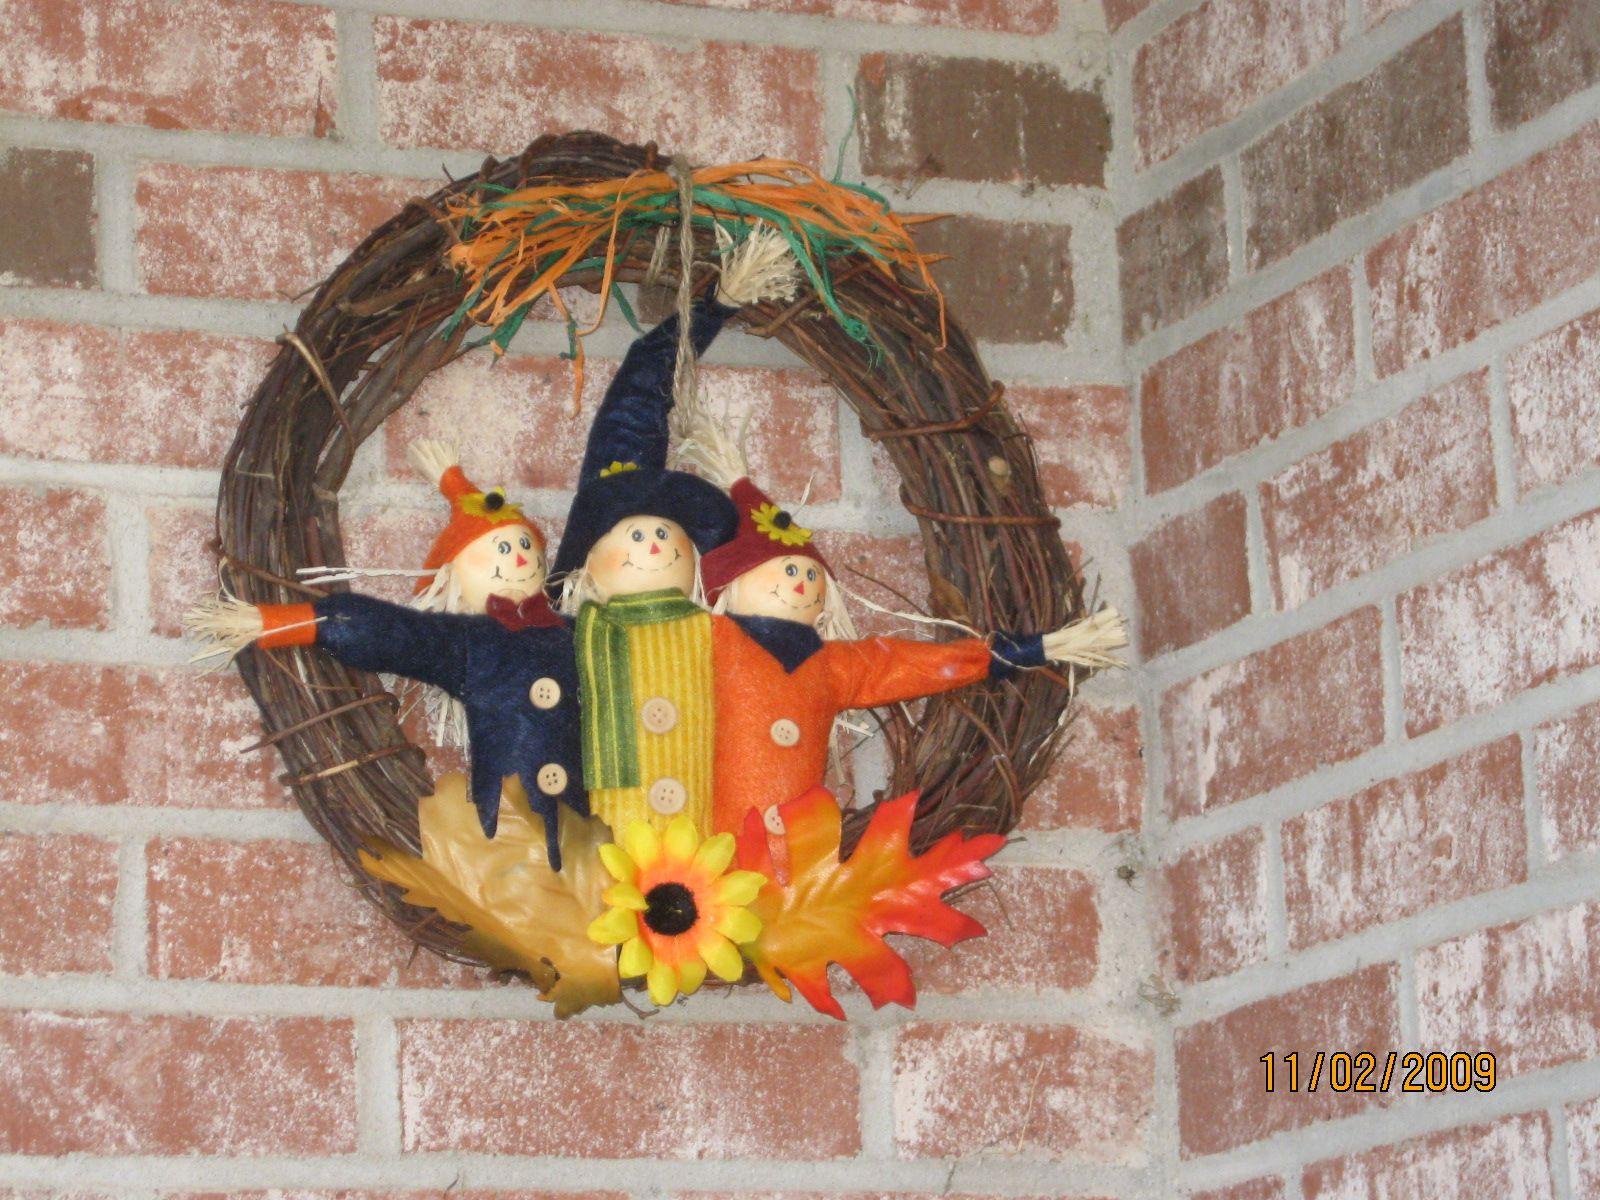 Halloween Decorations My Home Pinterest